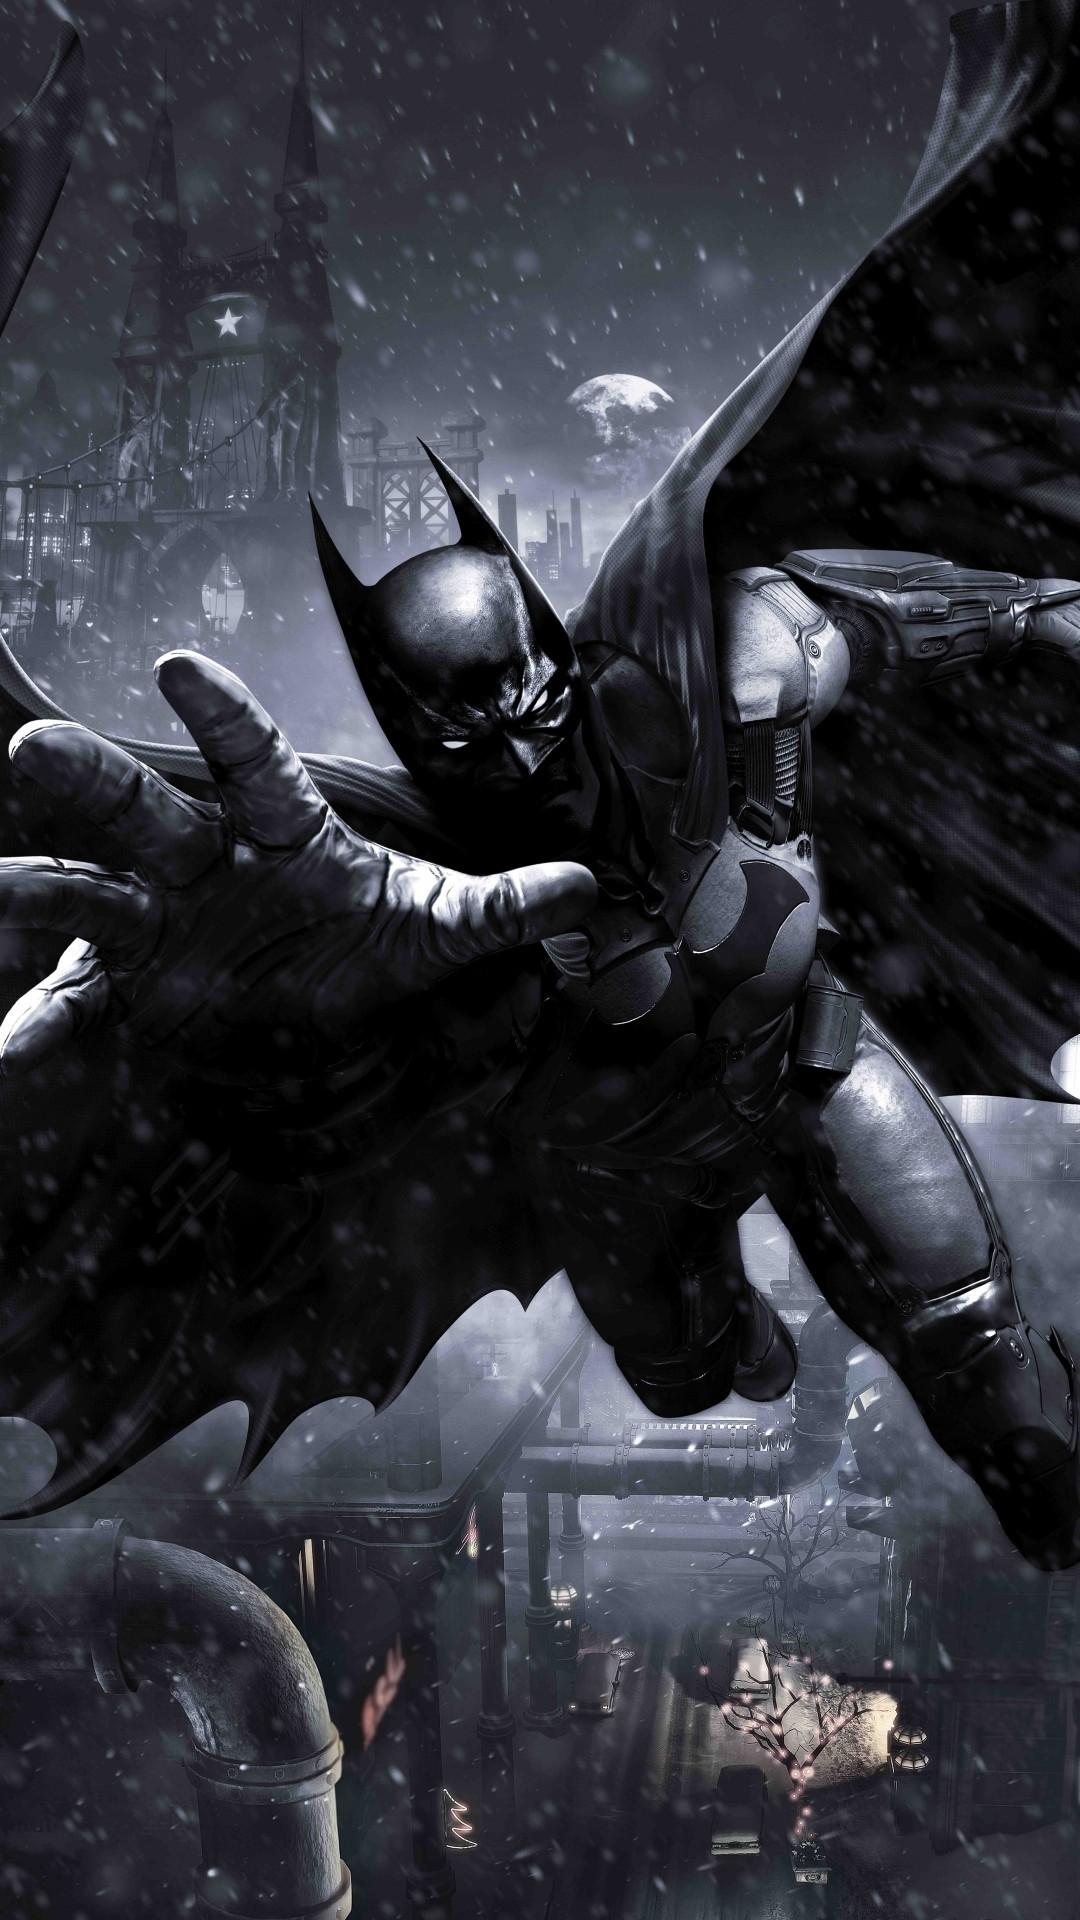 Free Batman Arkham Knight phone wallpaper by shalosky